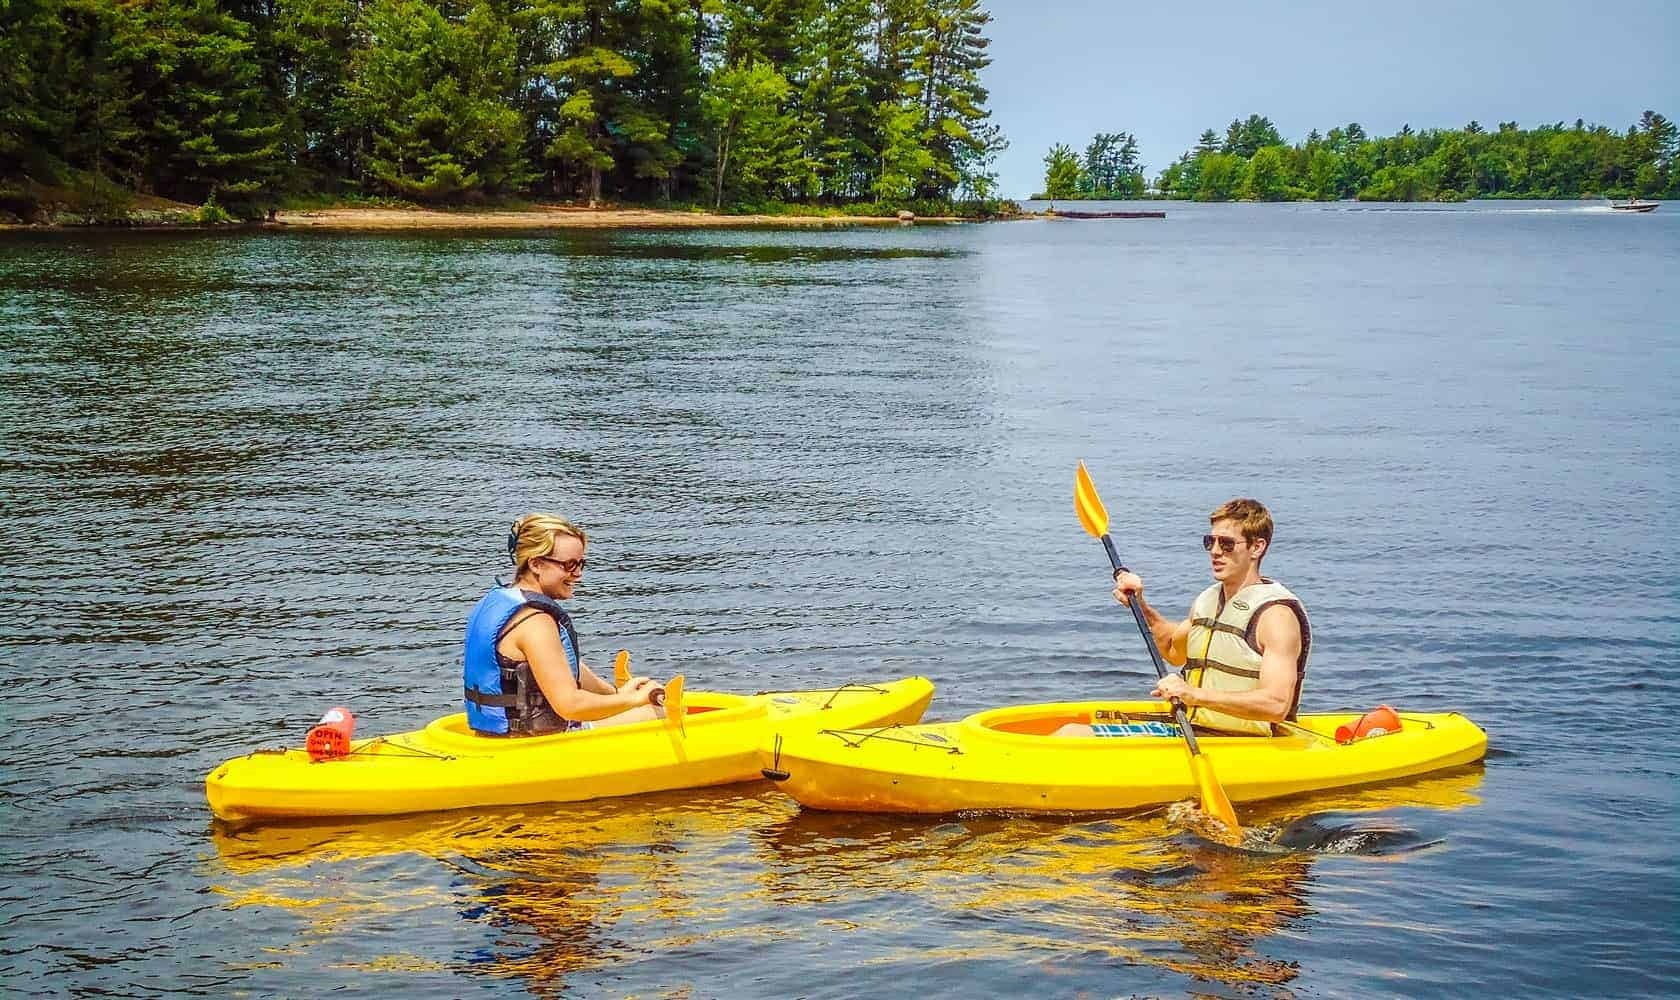 Summer Fun - Kayaks